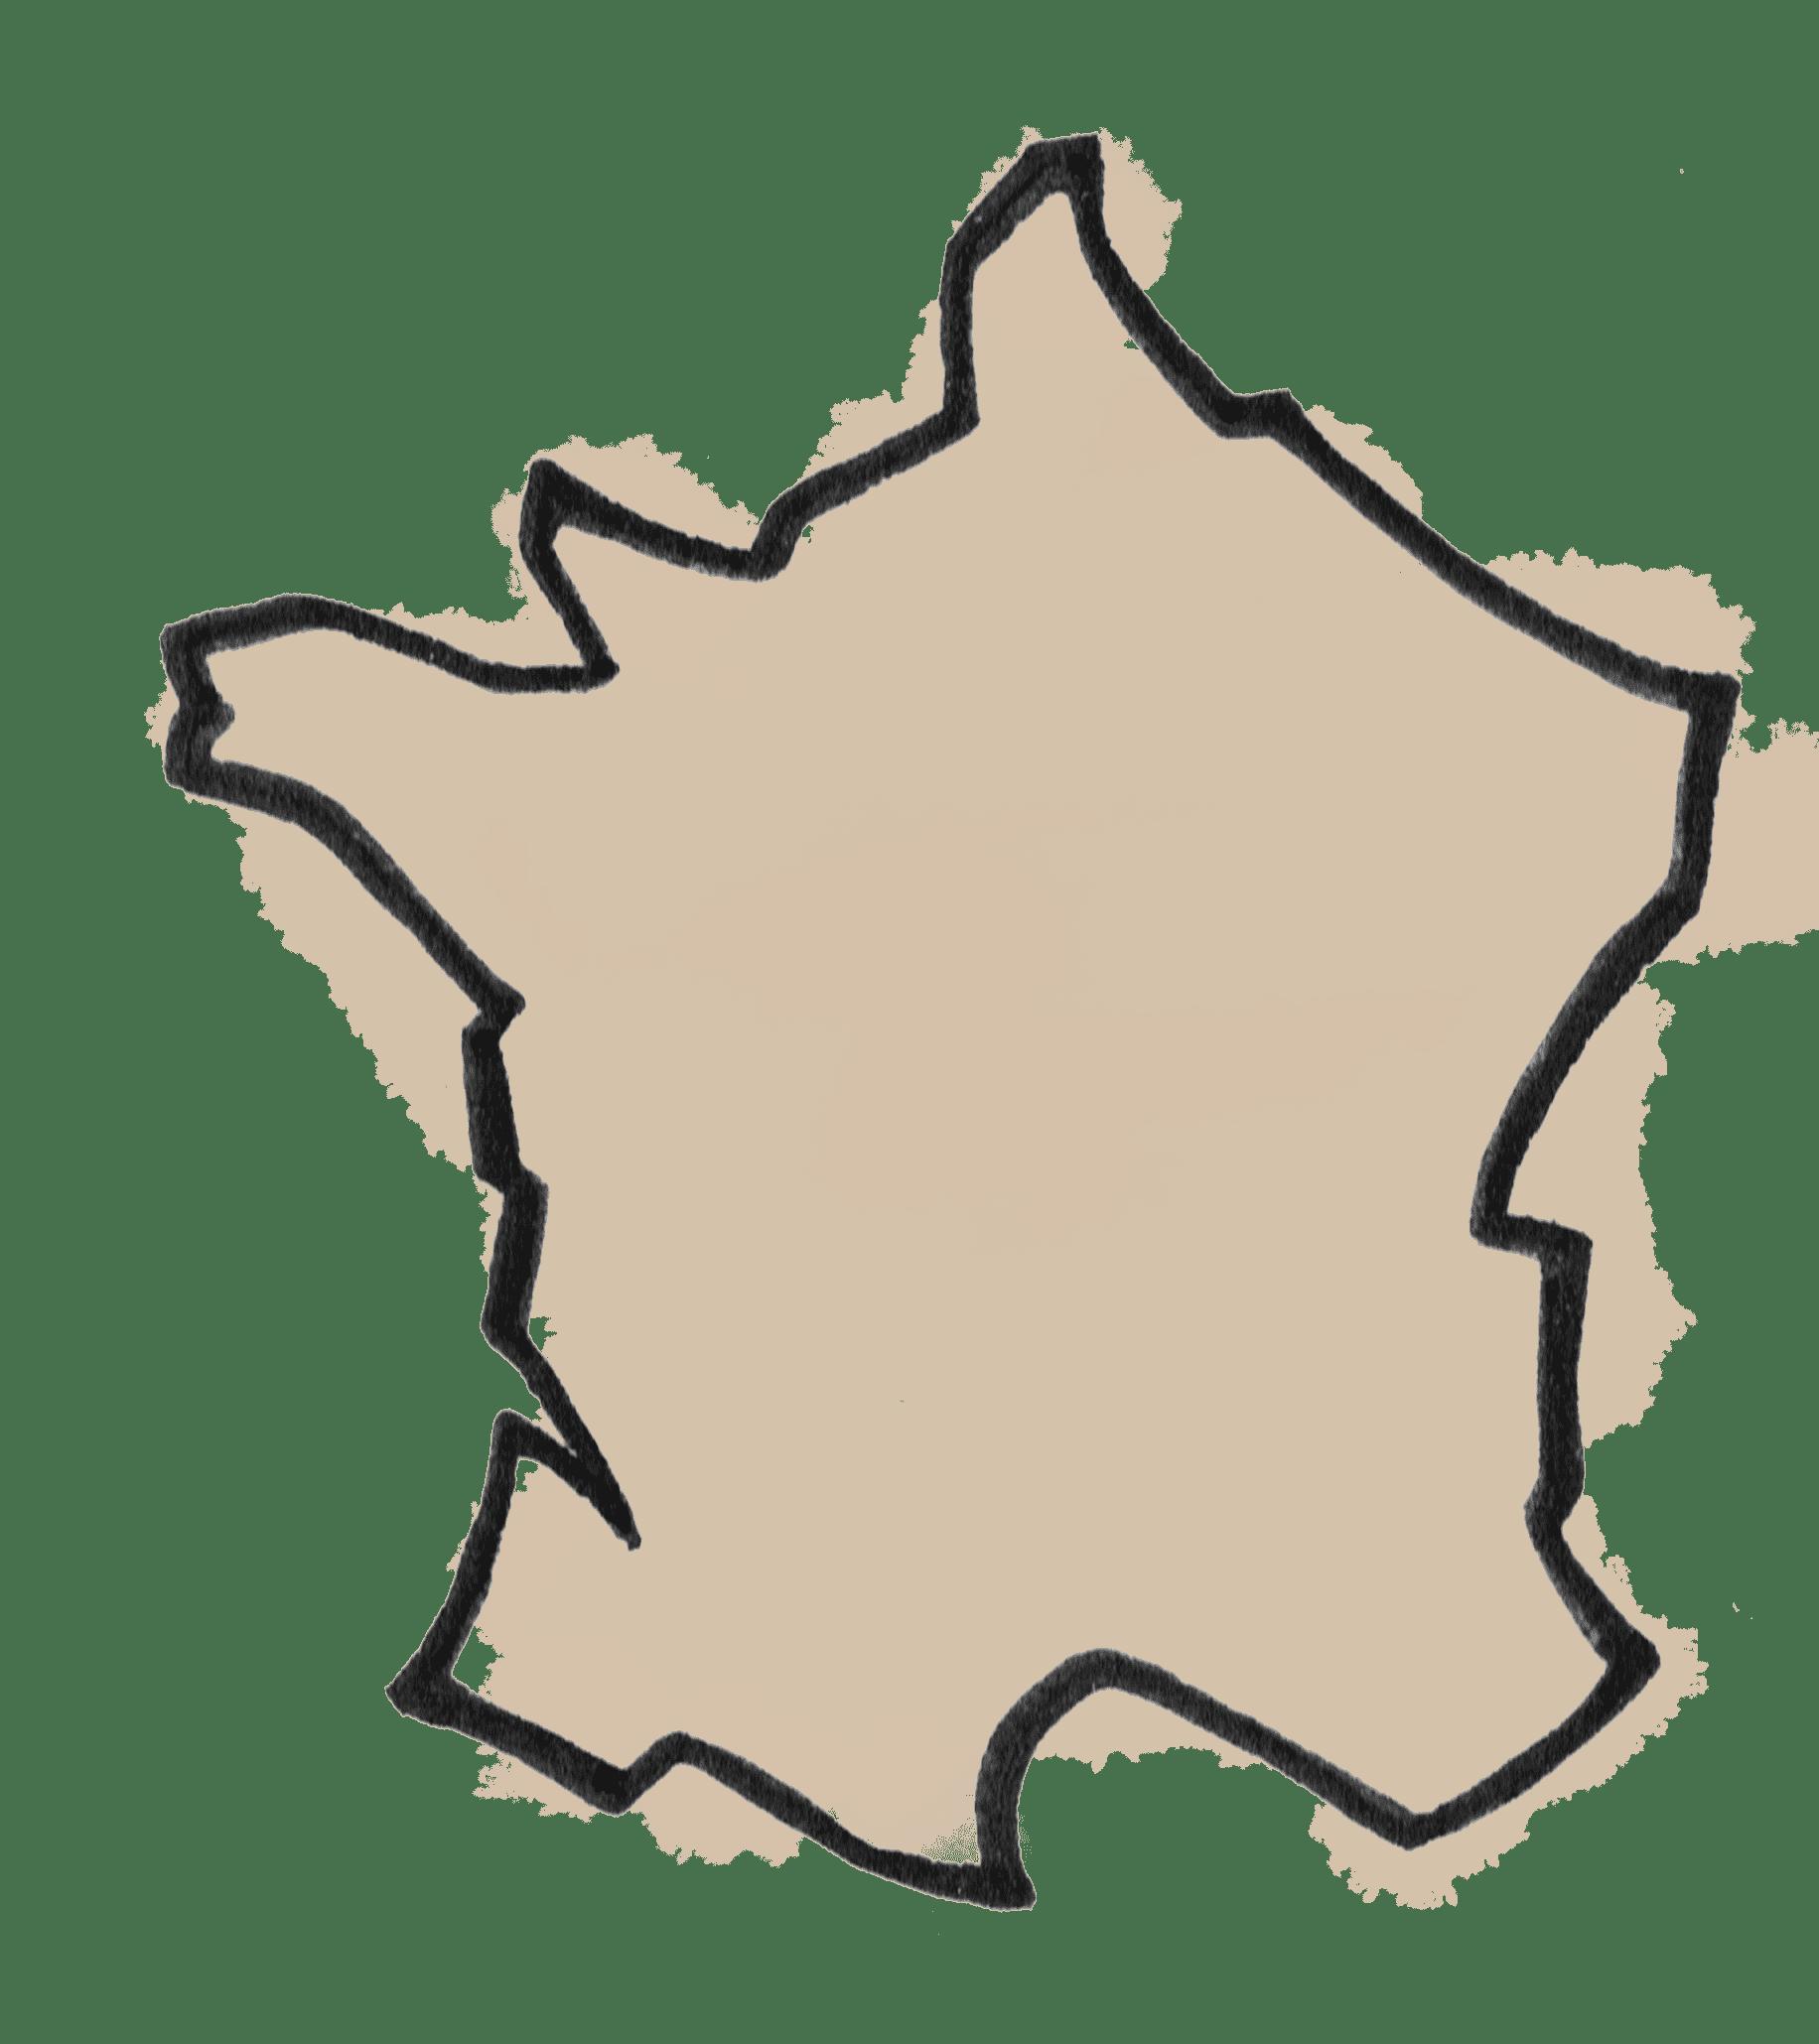 Dessin carte de France